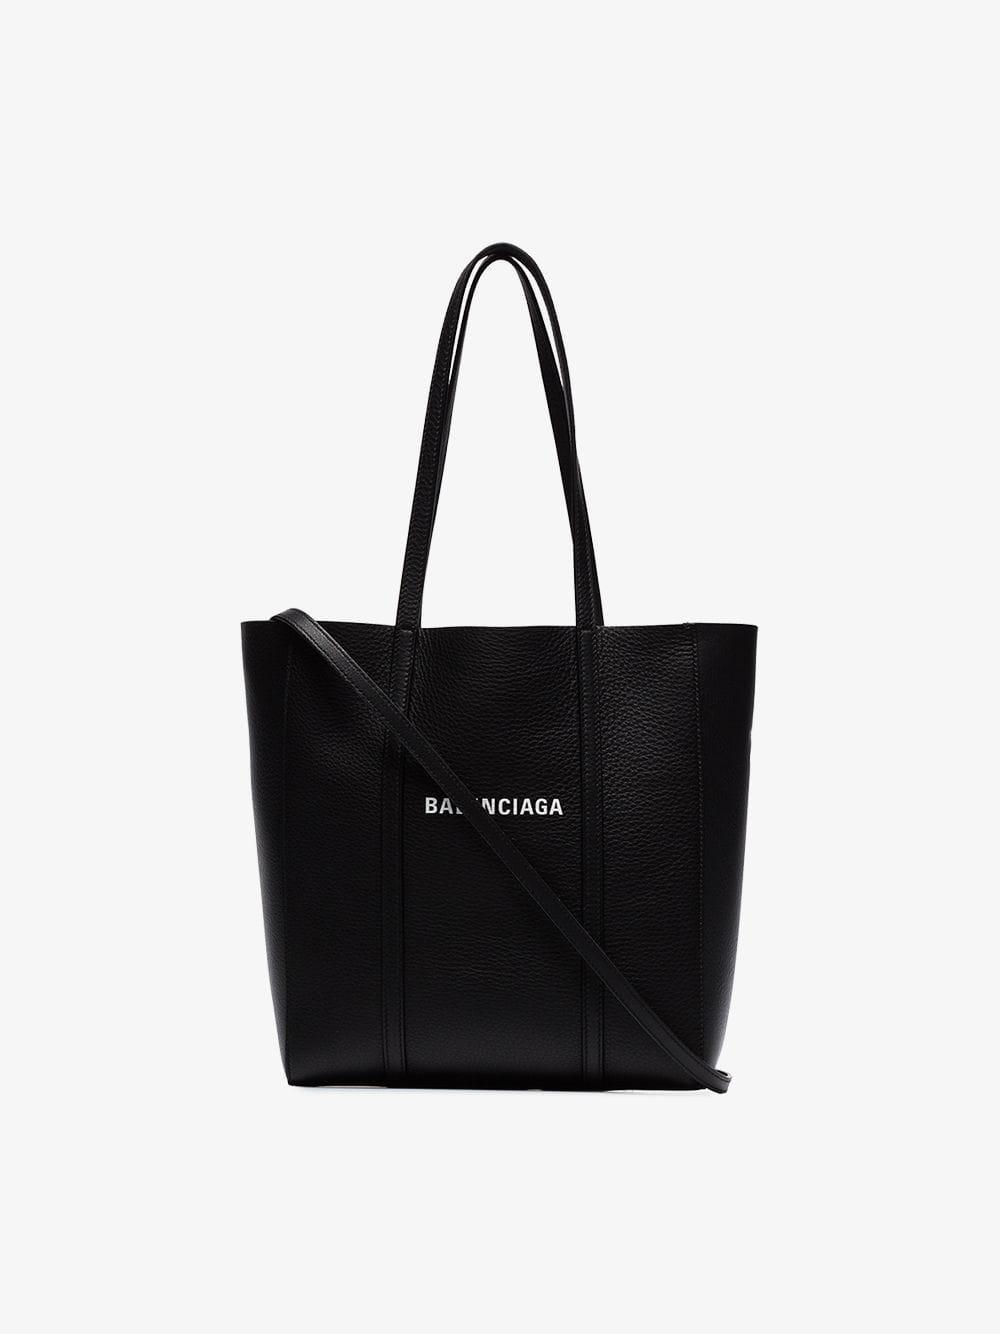 8112e6be5f78 Balenciaga - Black Everyday Xs Leather Tote - Lyst. View fullscreen